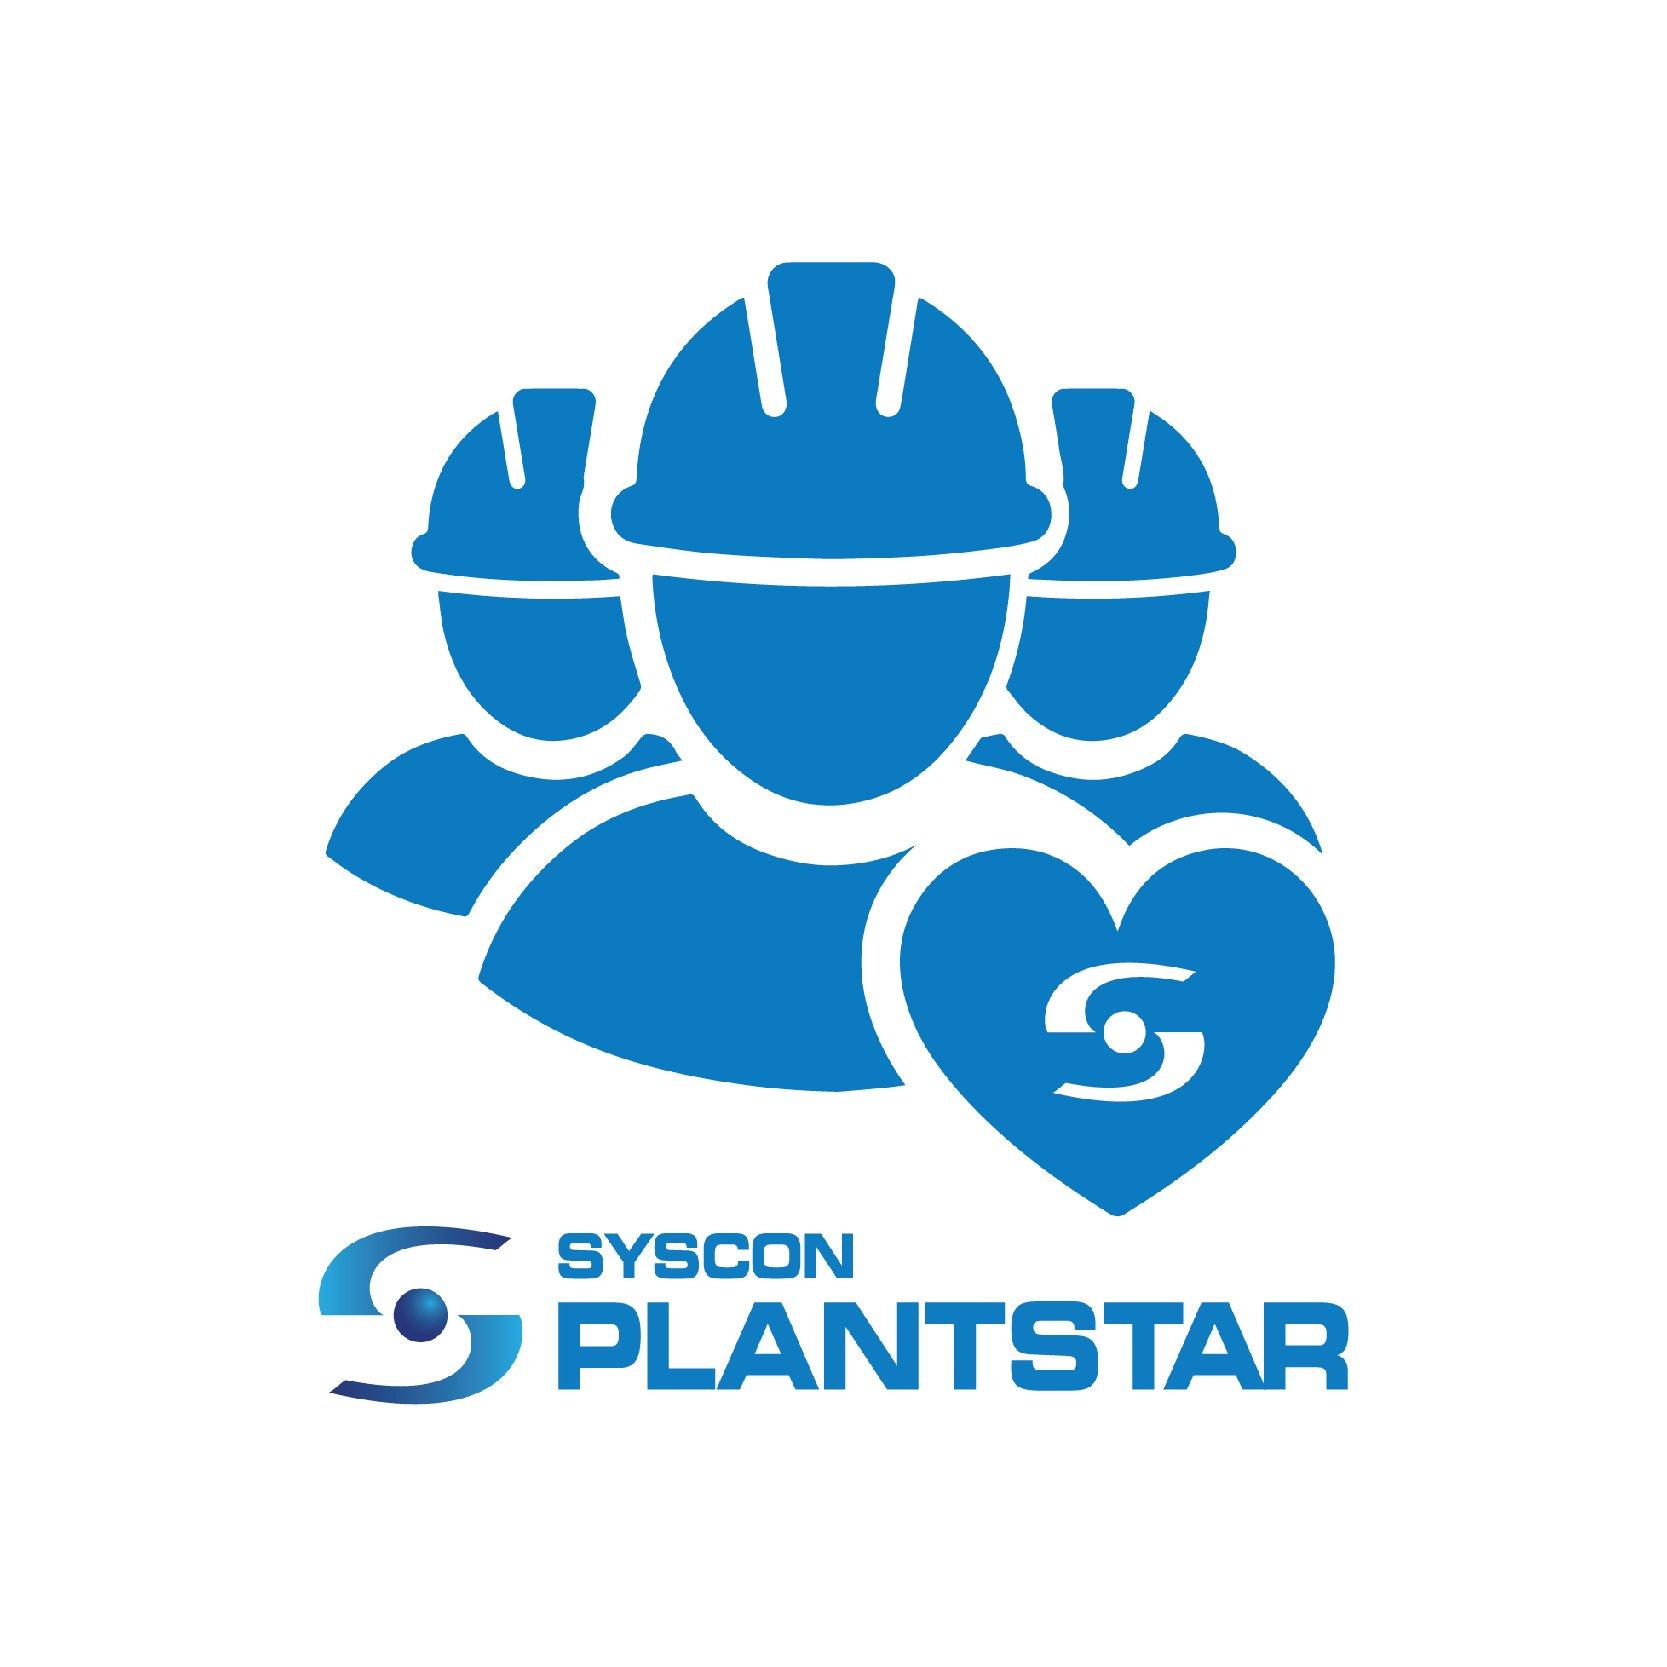 SYSCON PlantStar